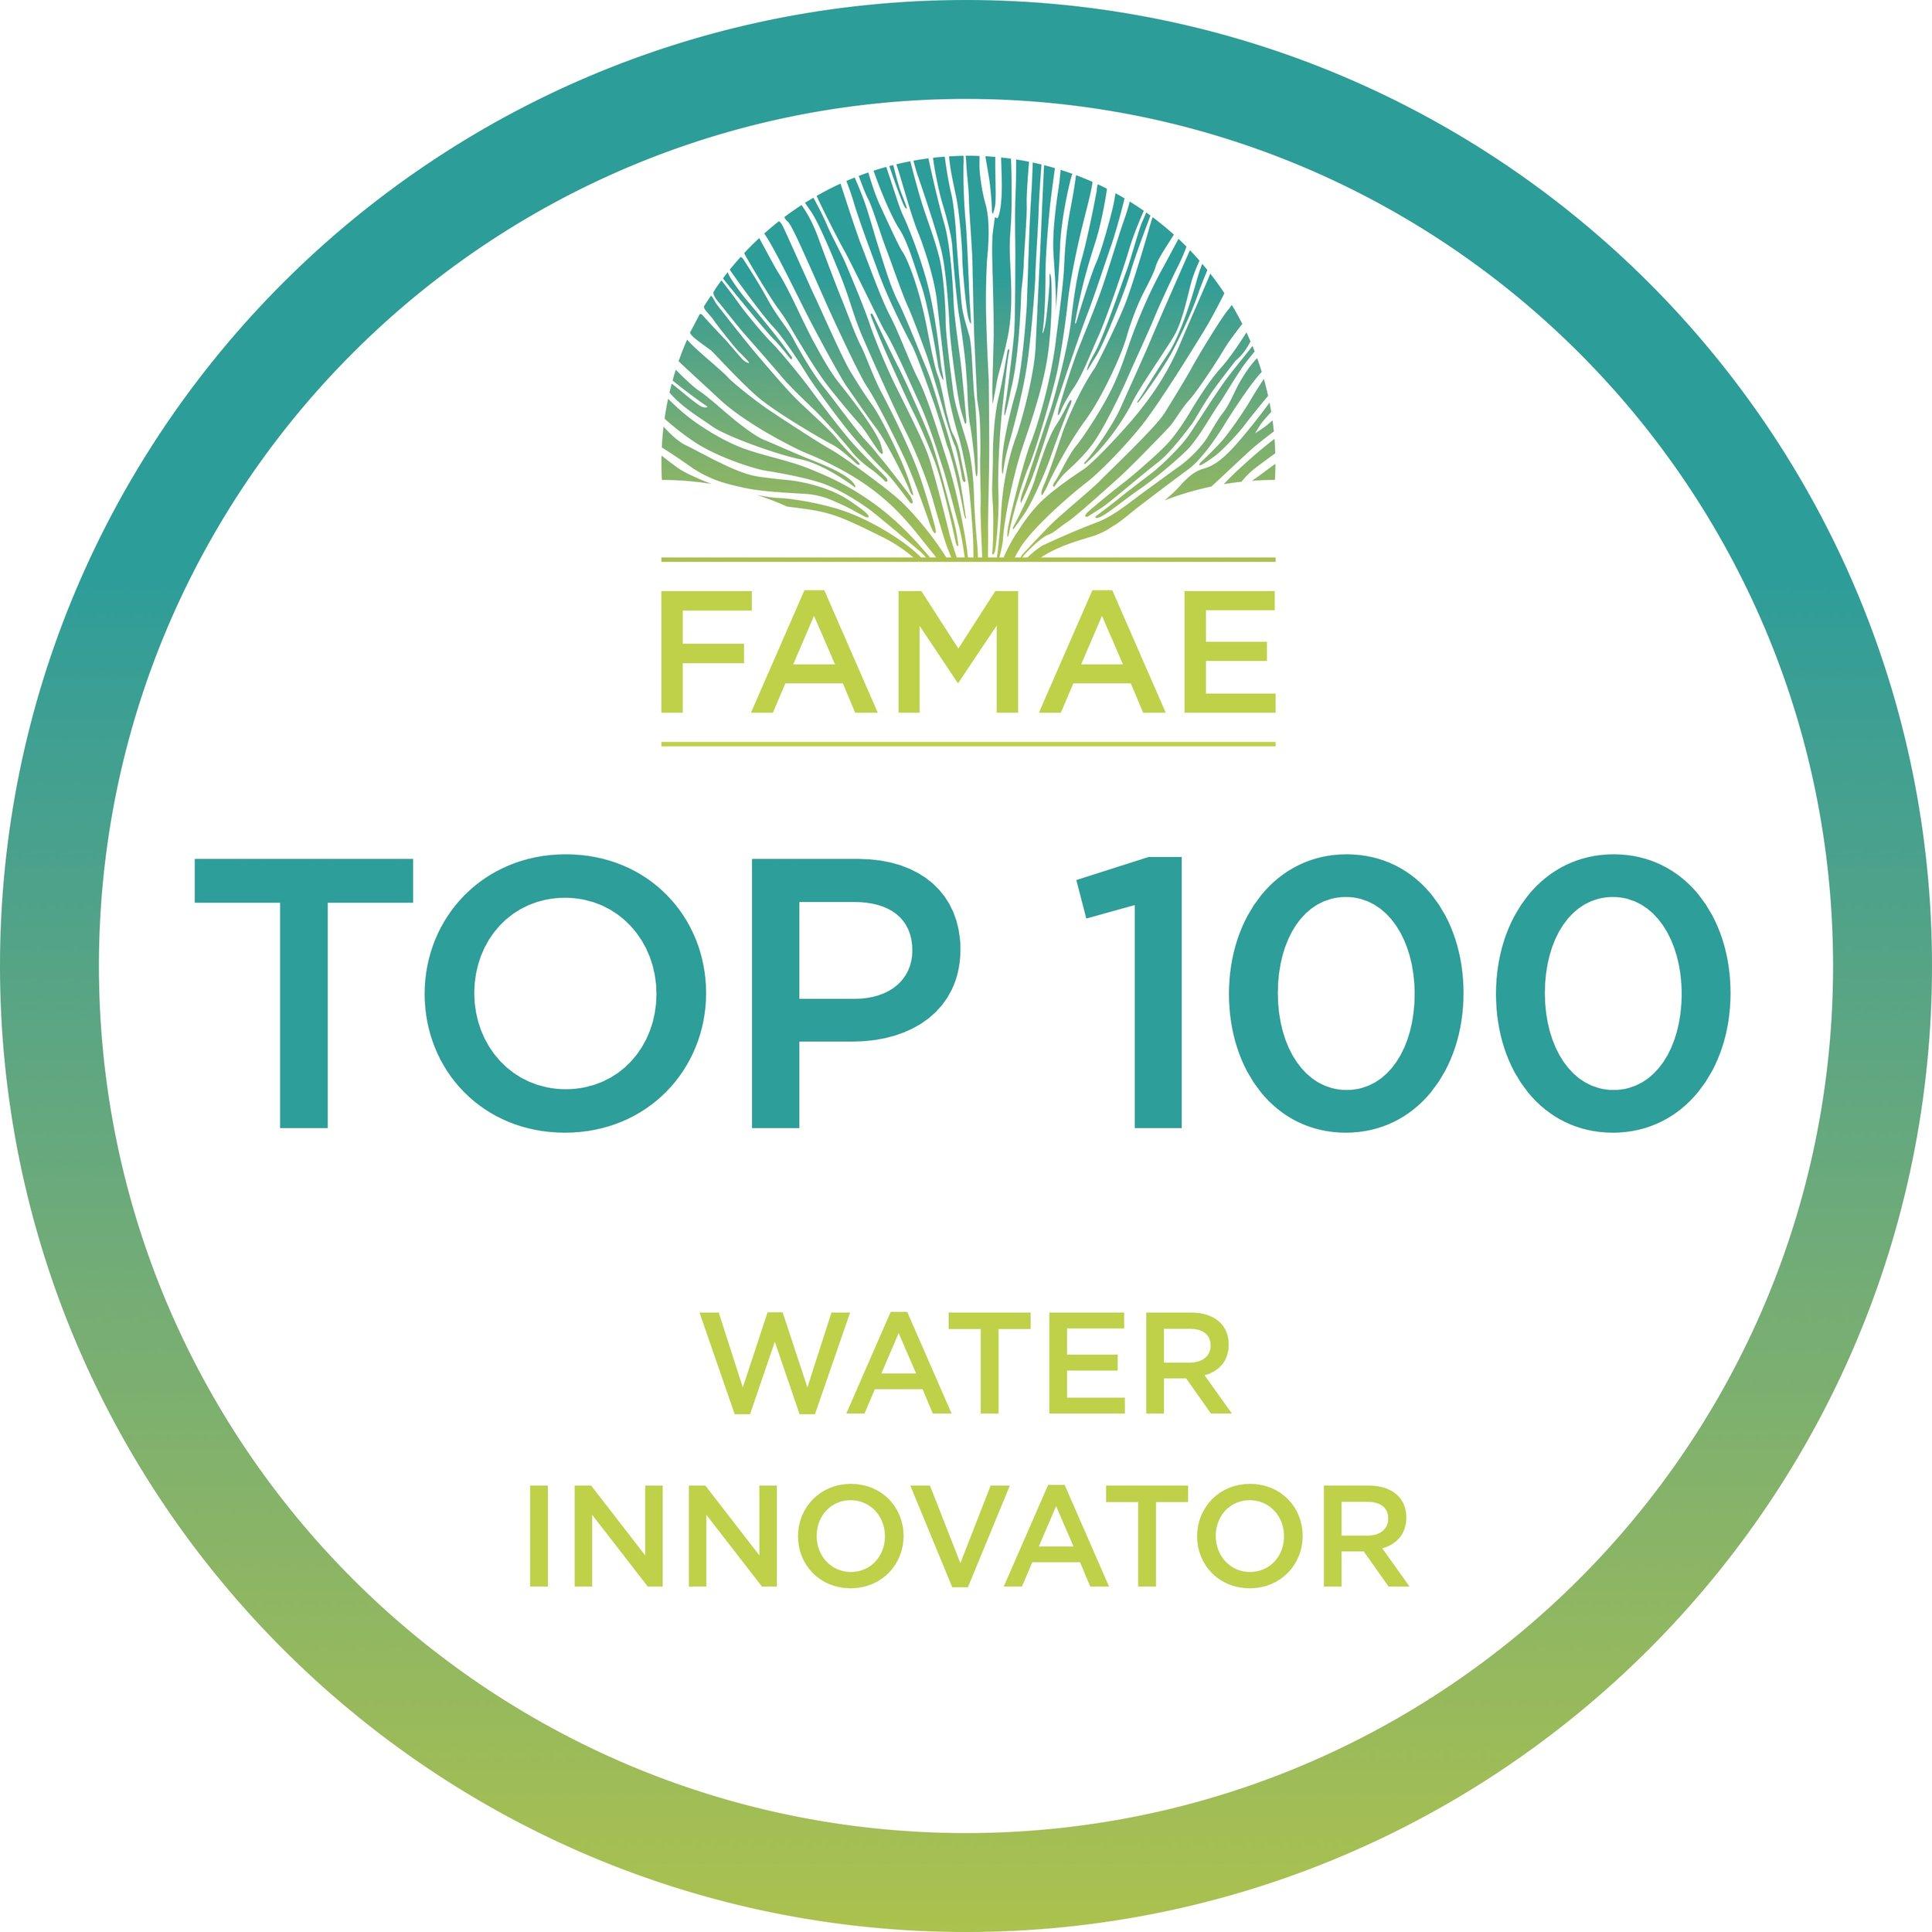 Famae Top 100.jpg